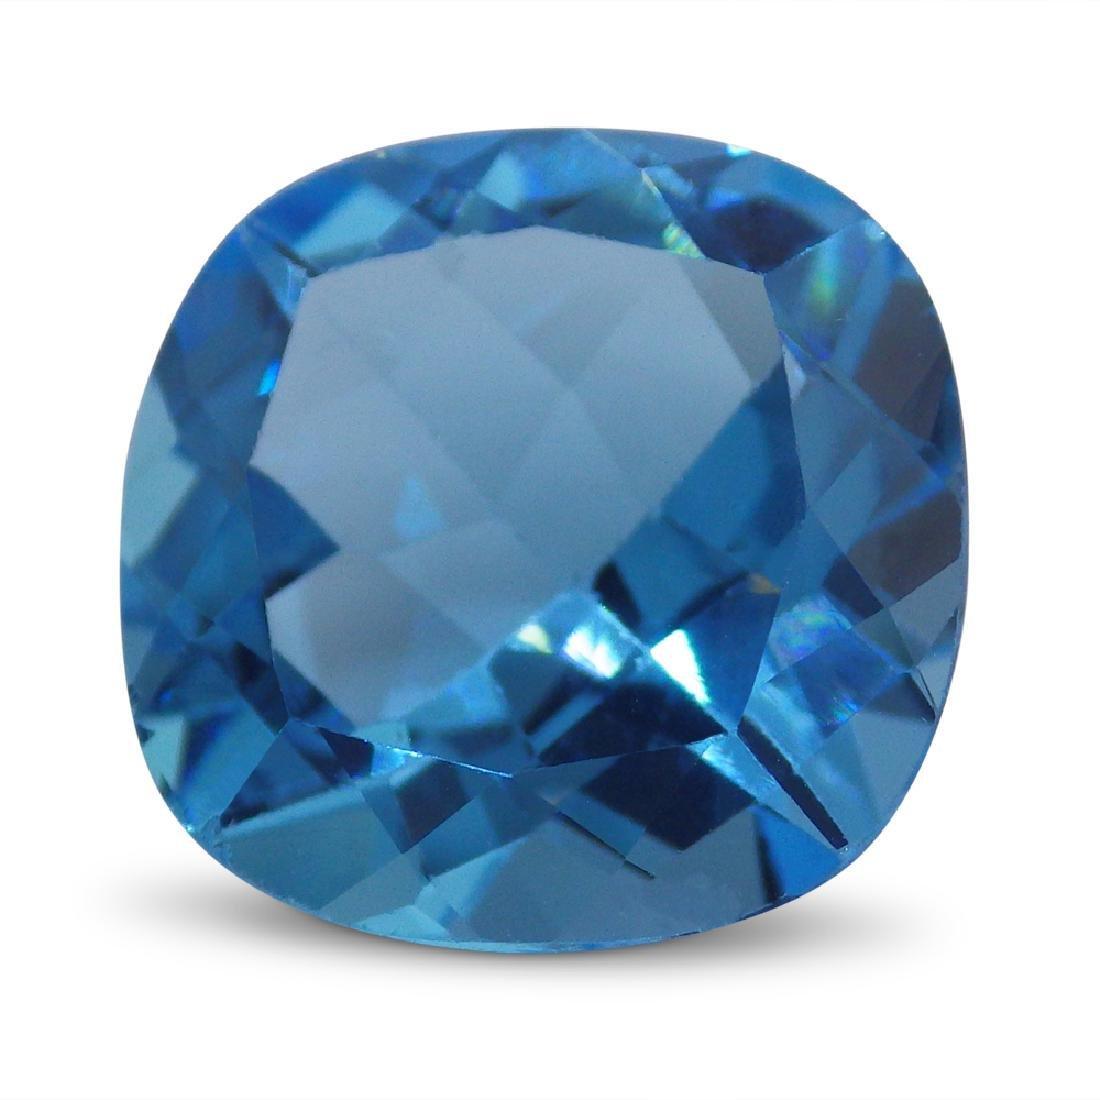 15.13 Carat Loose Cushion Blue Topaz - 2